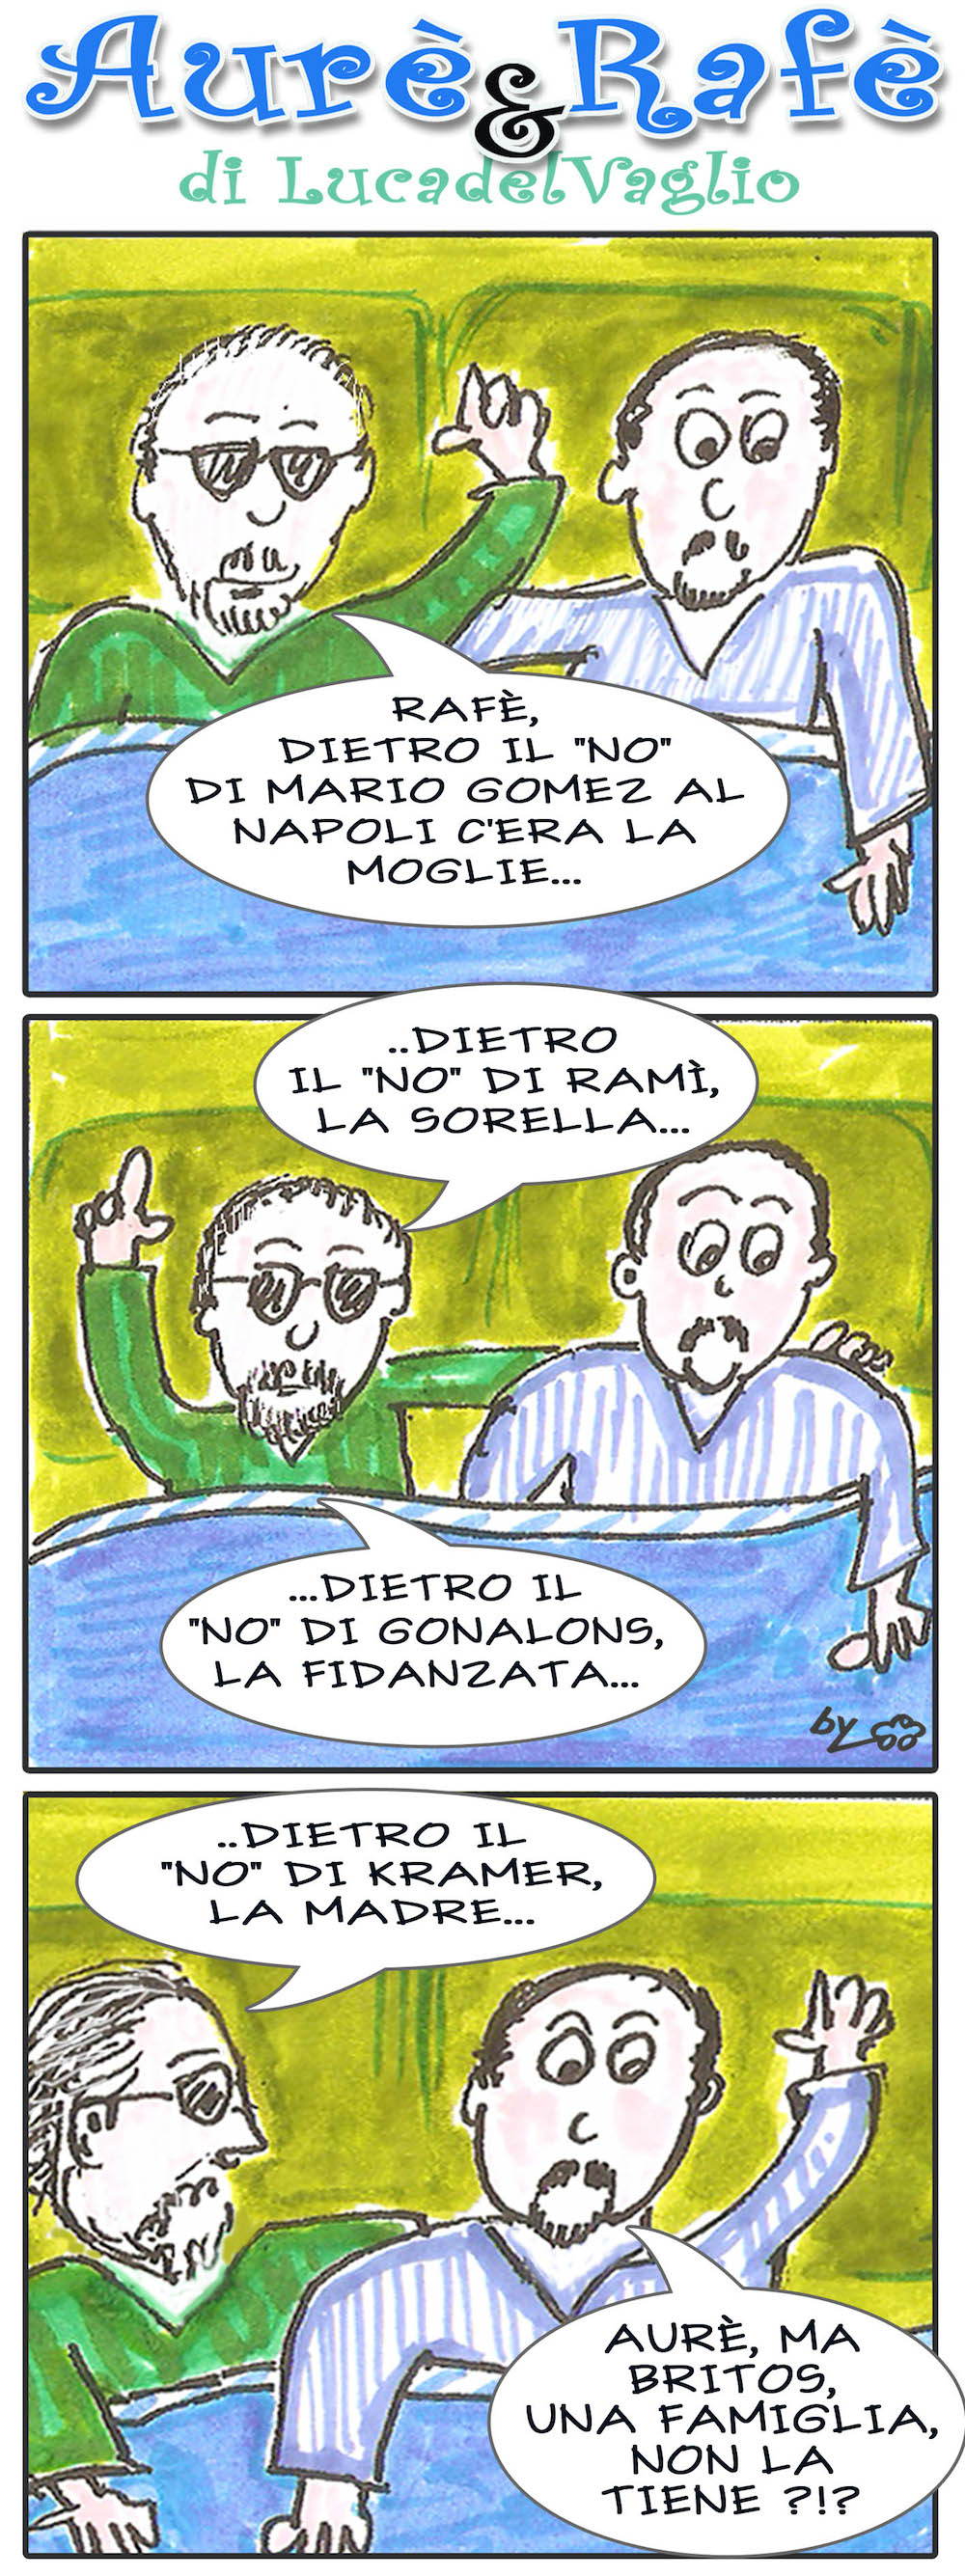 Aure', Rafe' e i no al Napoli